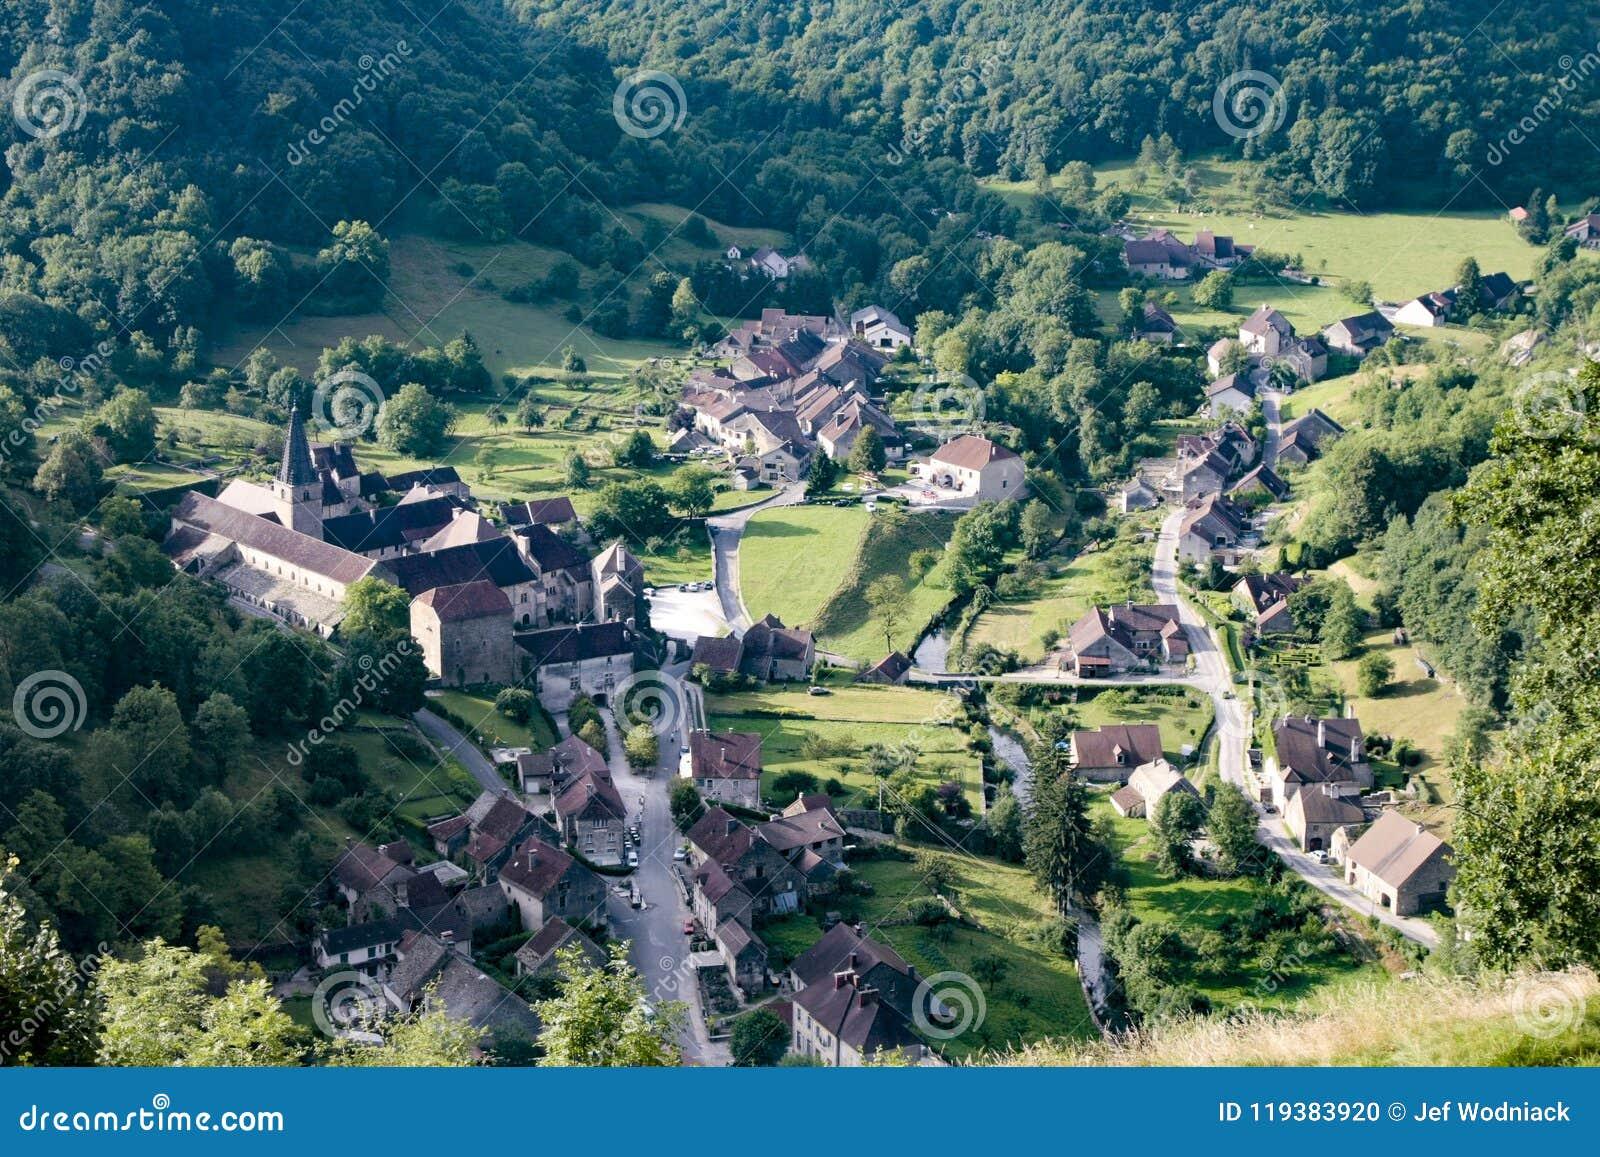 Old medieval village of Baume les Messieurs in France